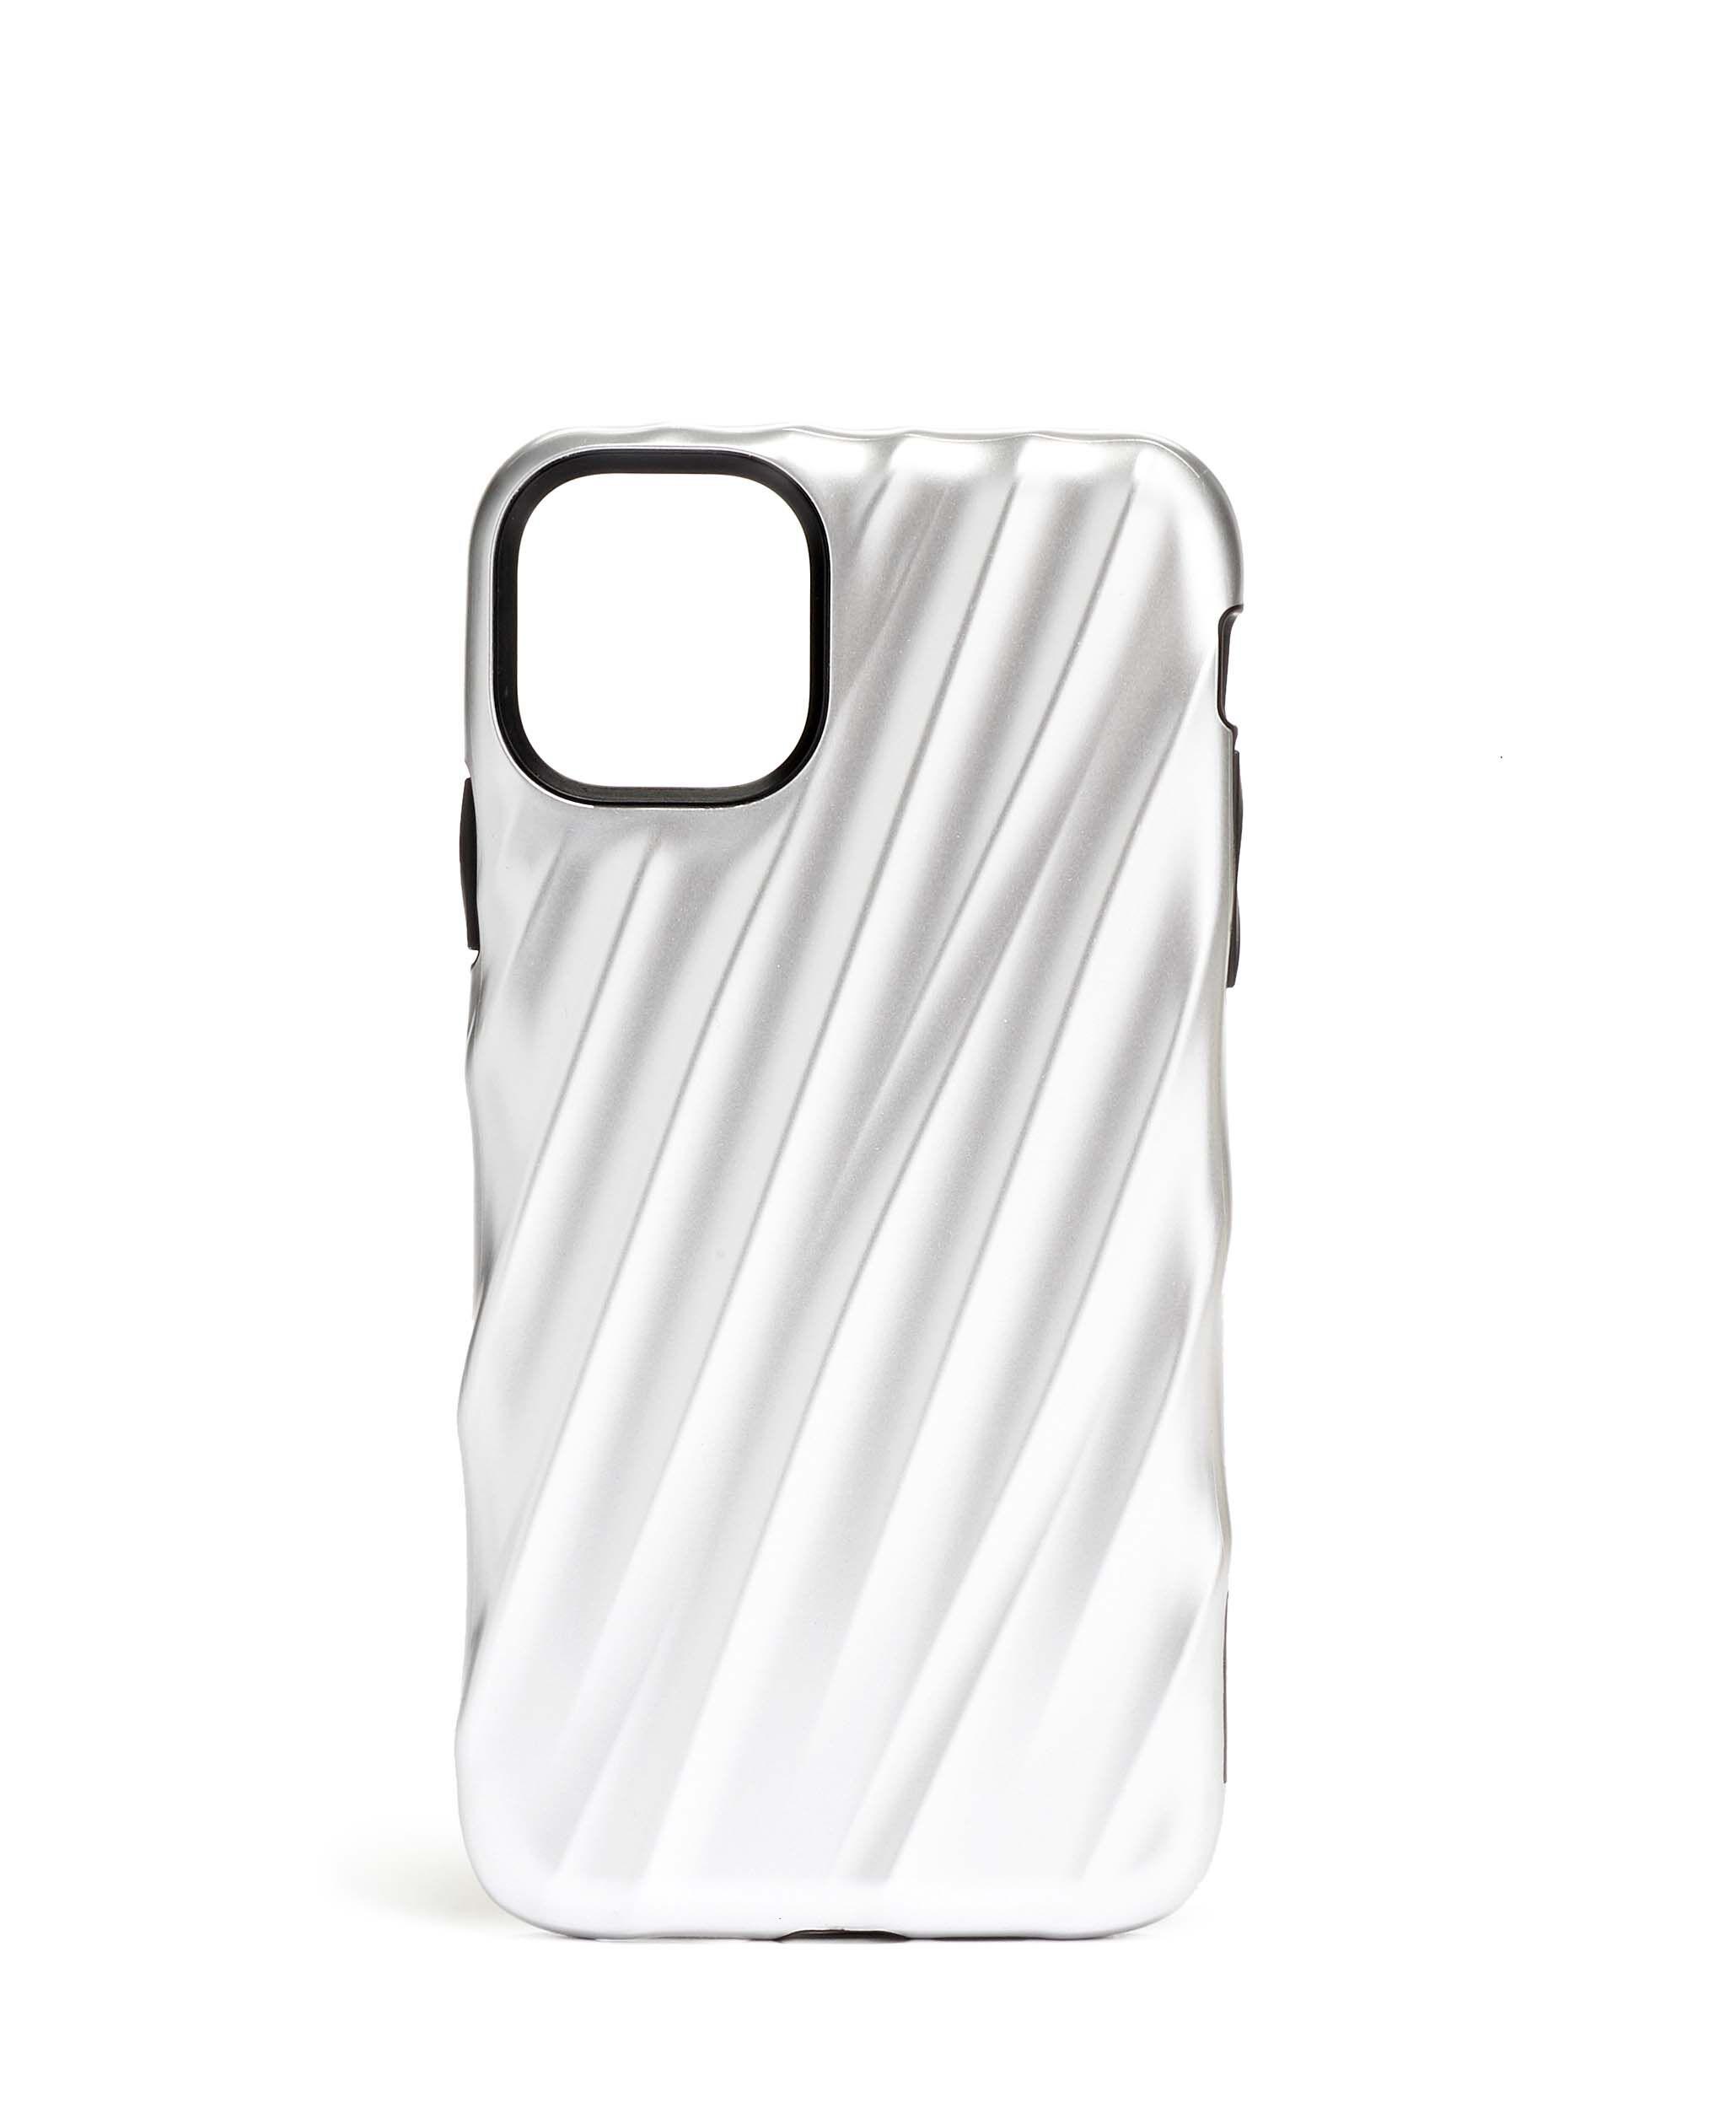 19 Degree Case Iphone 11 Pro Max Mobile Accessory